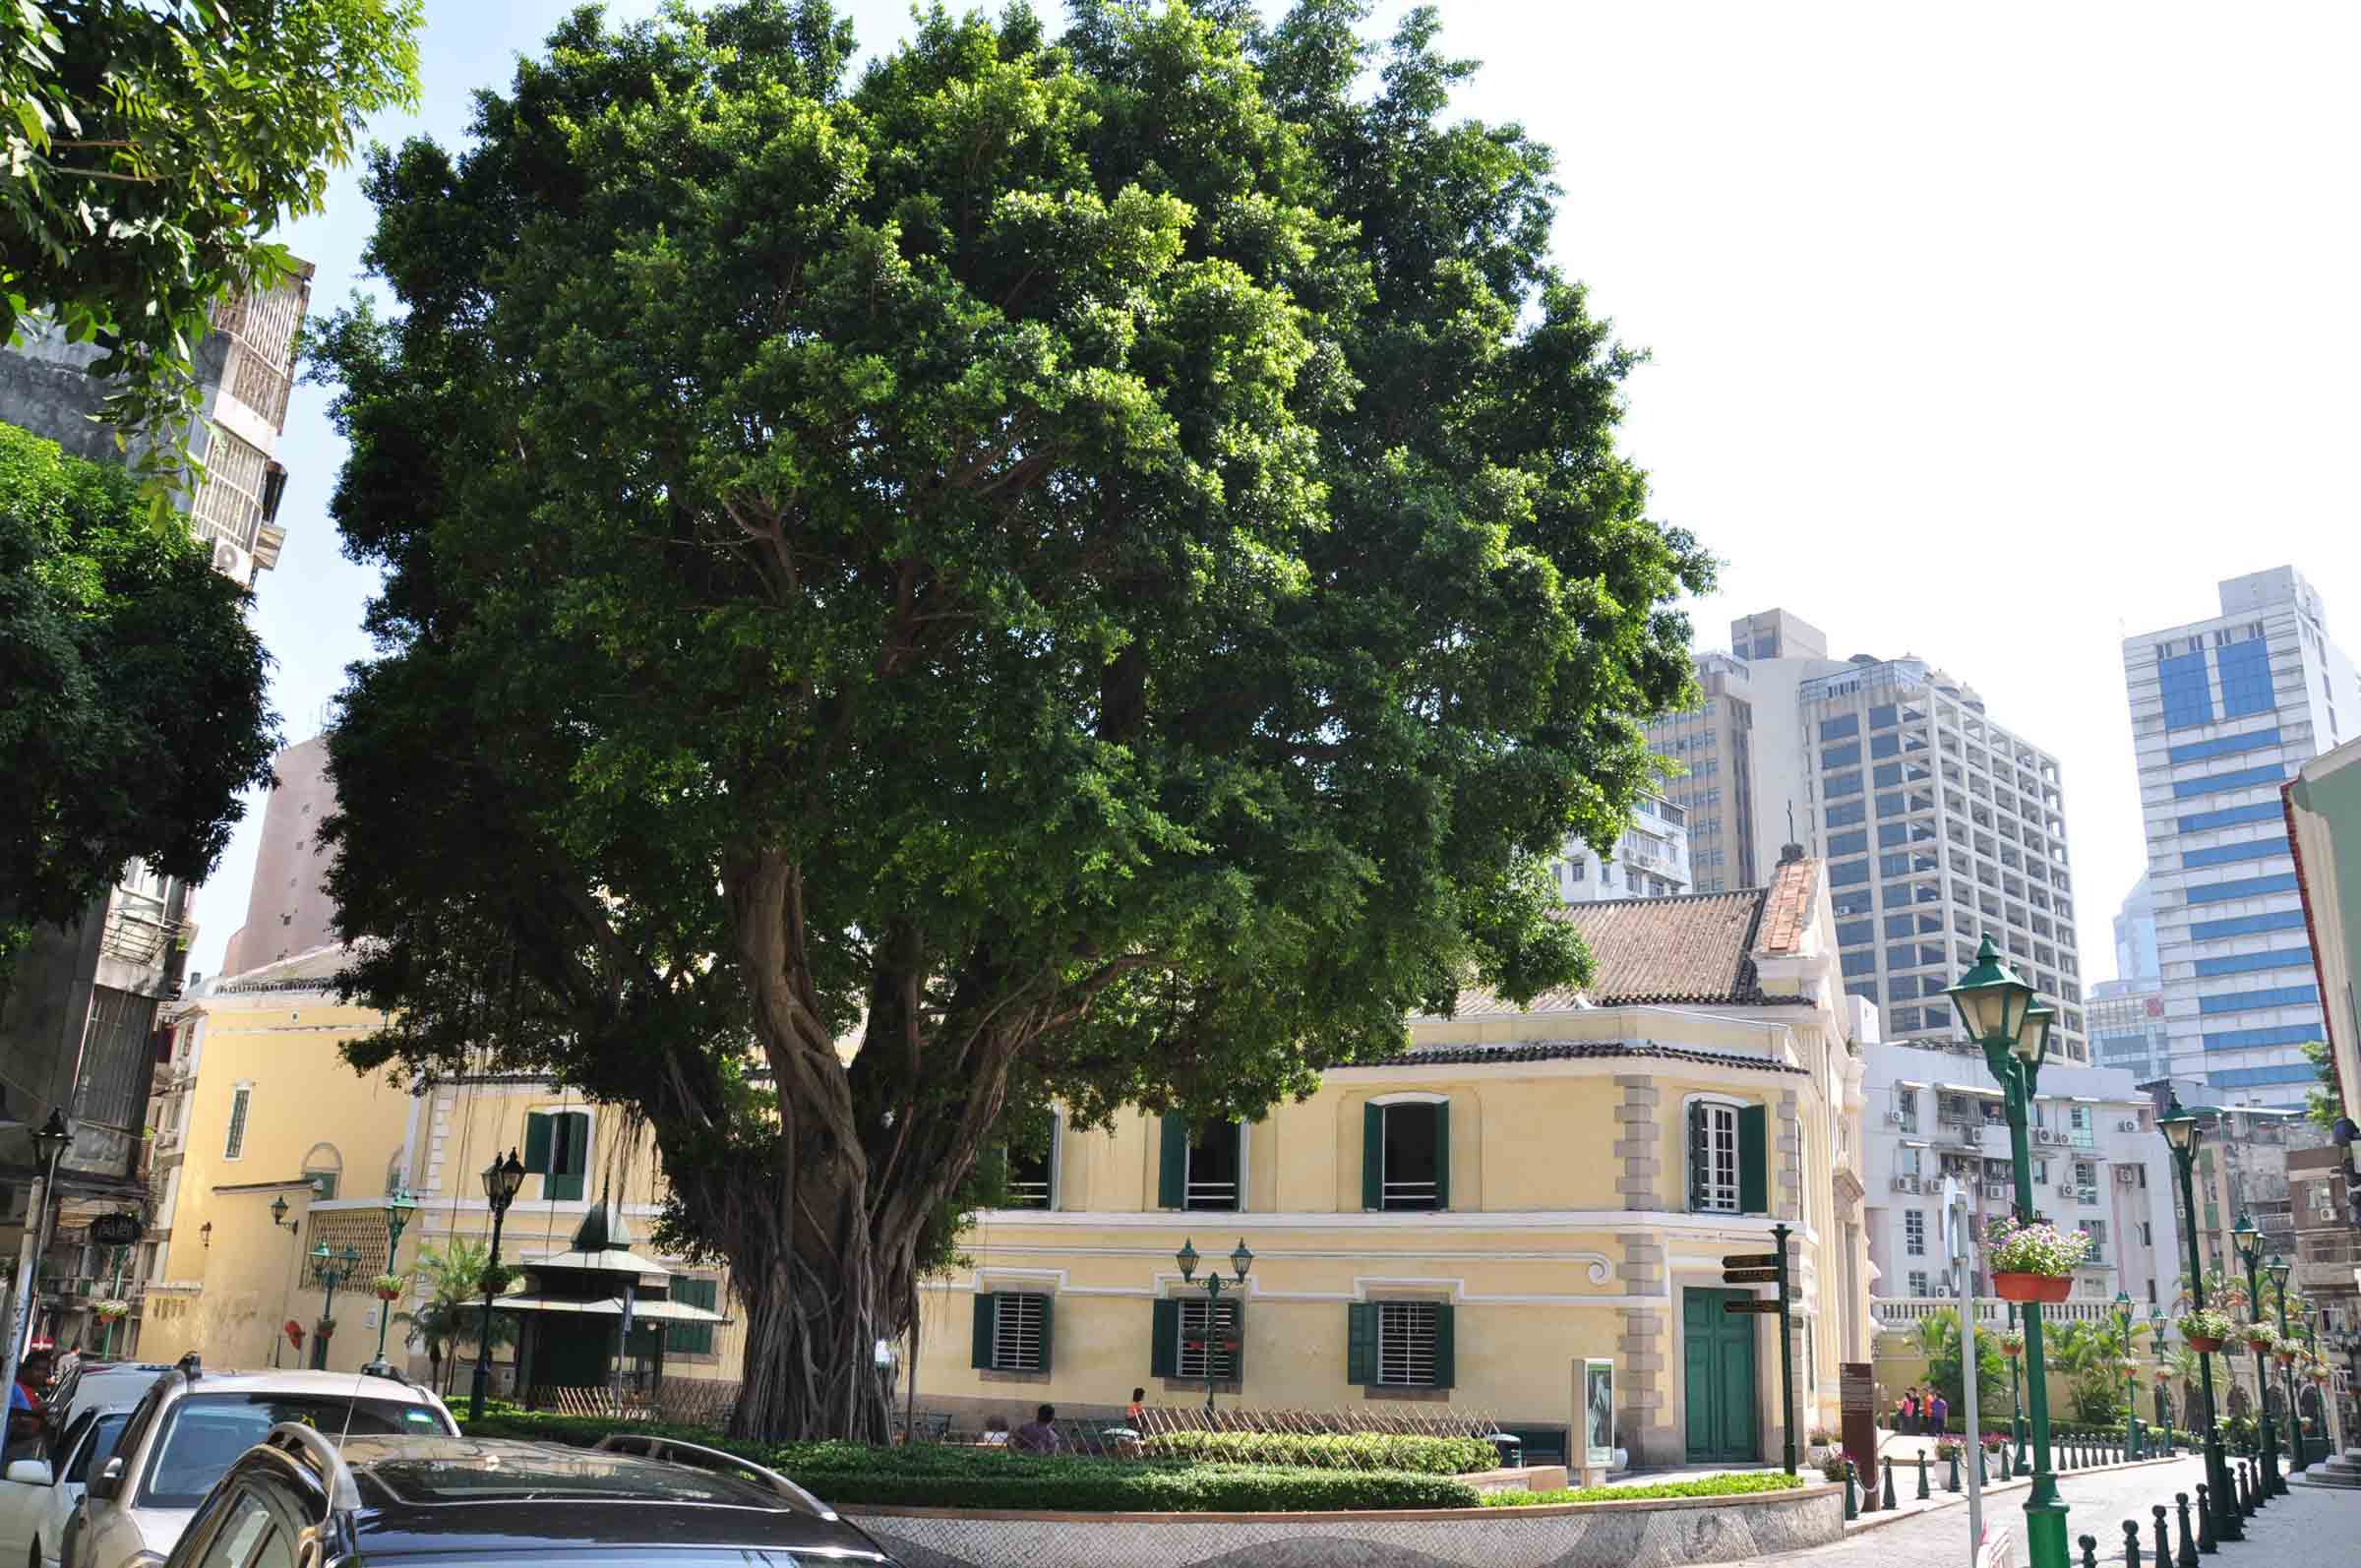 Macau World Heritage Site: St. Augustine's Square